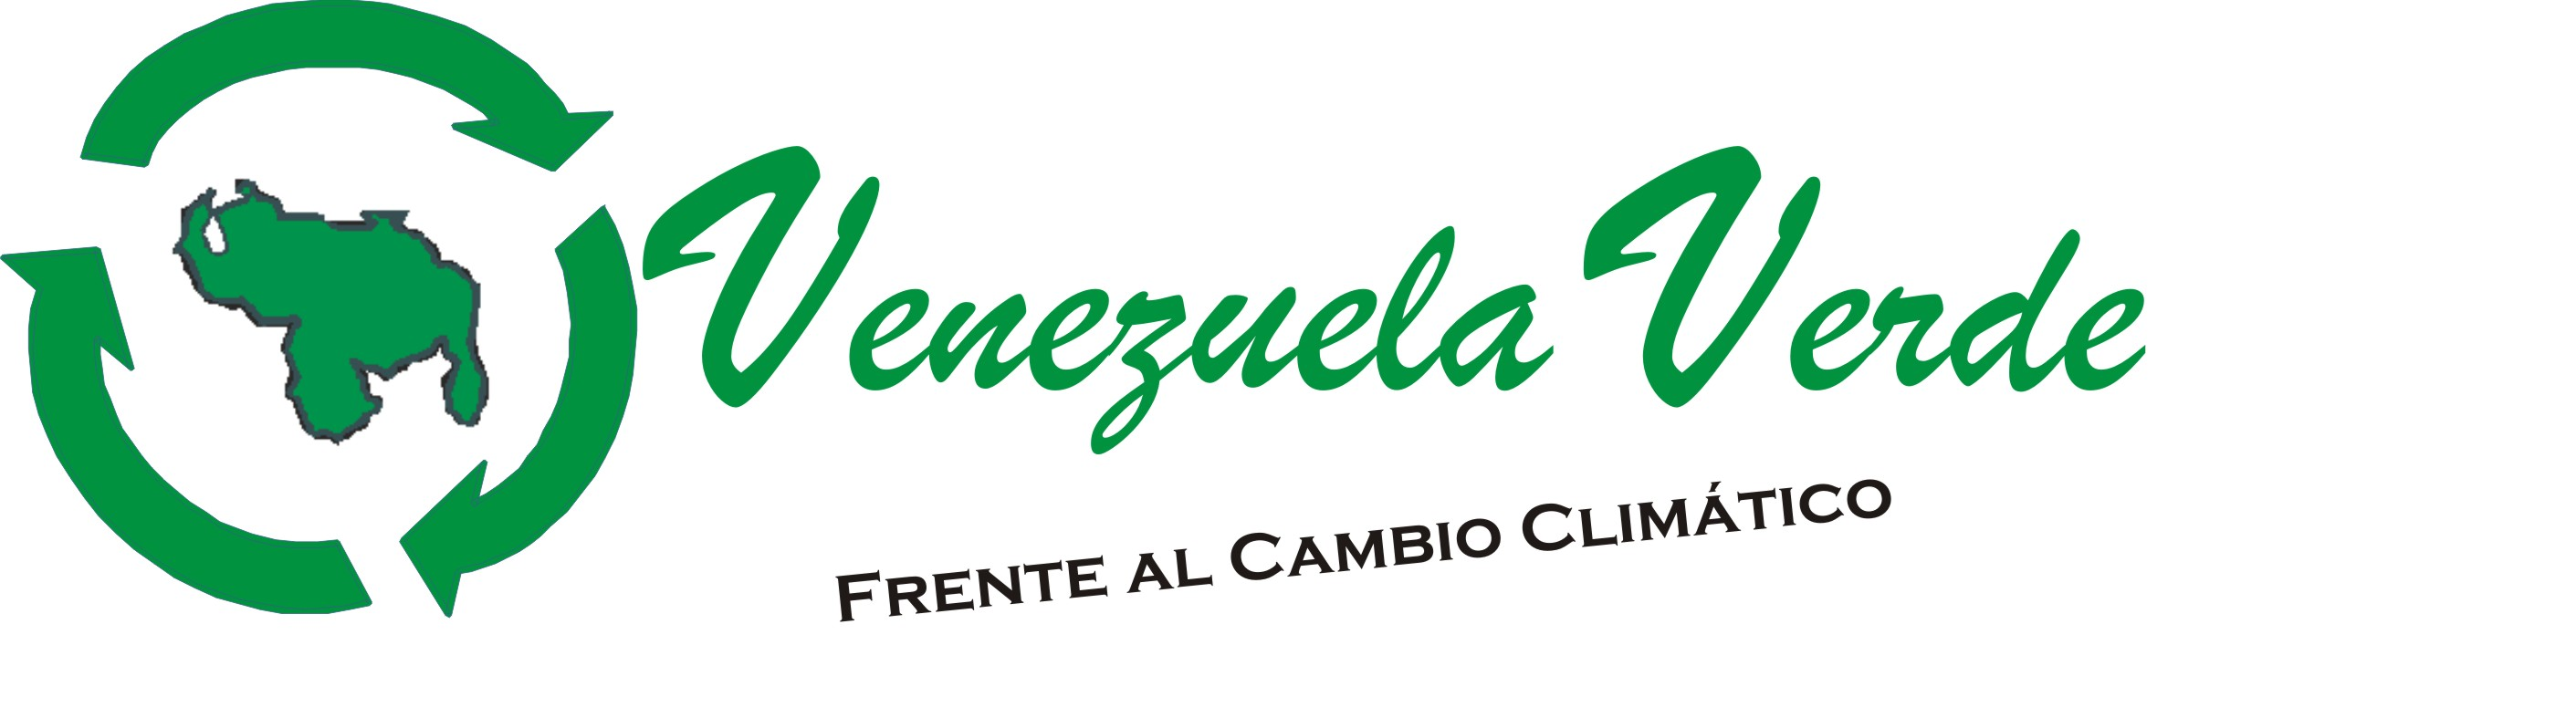 primer logo de Venezuela Verde